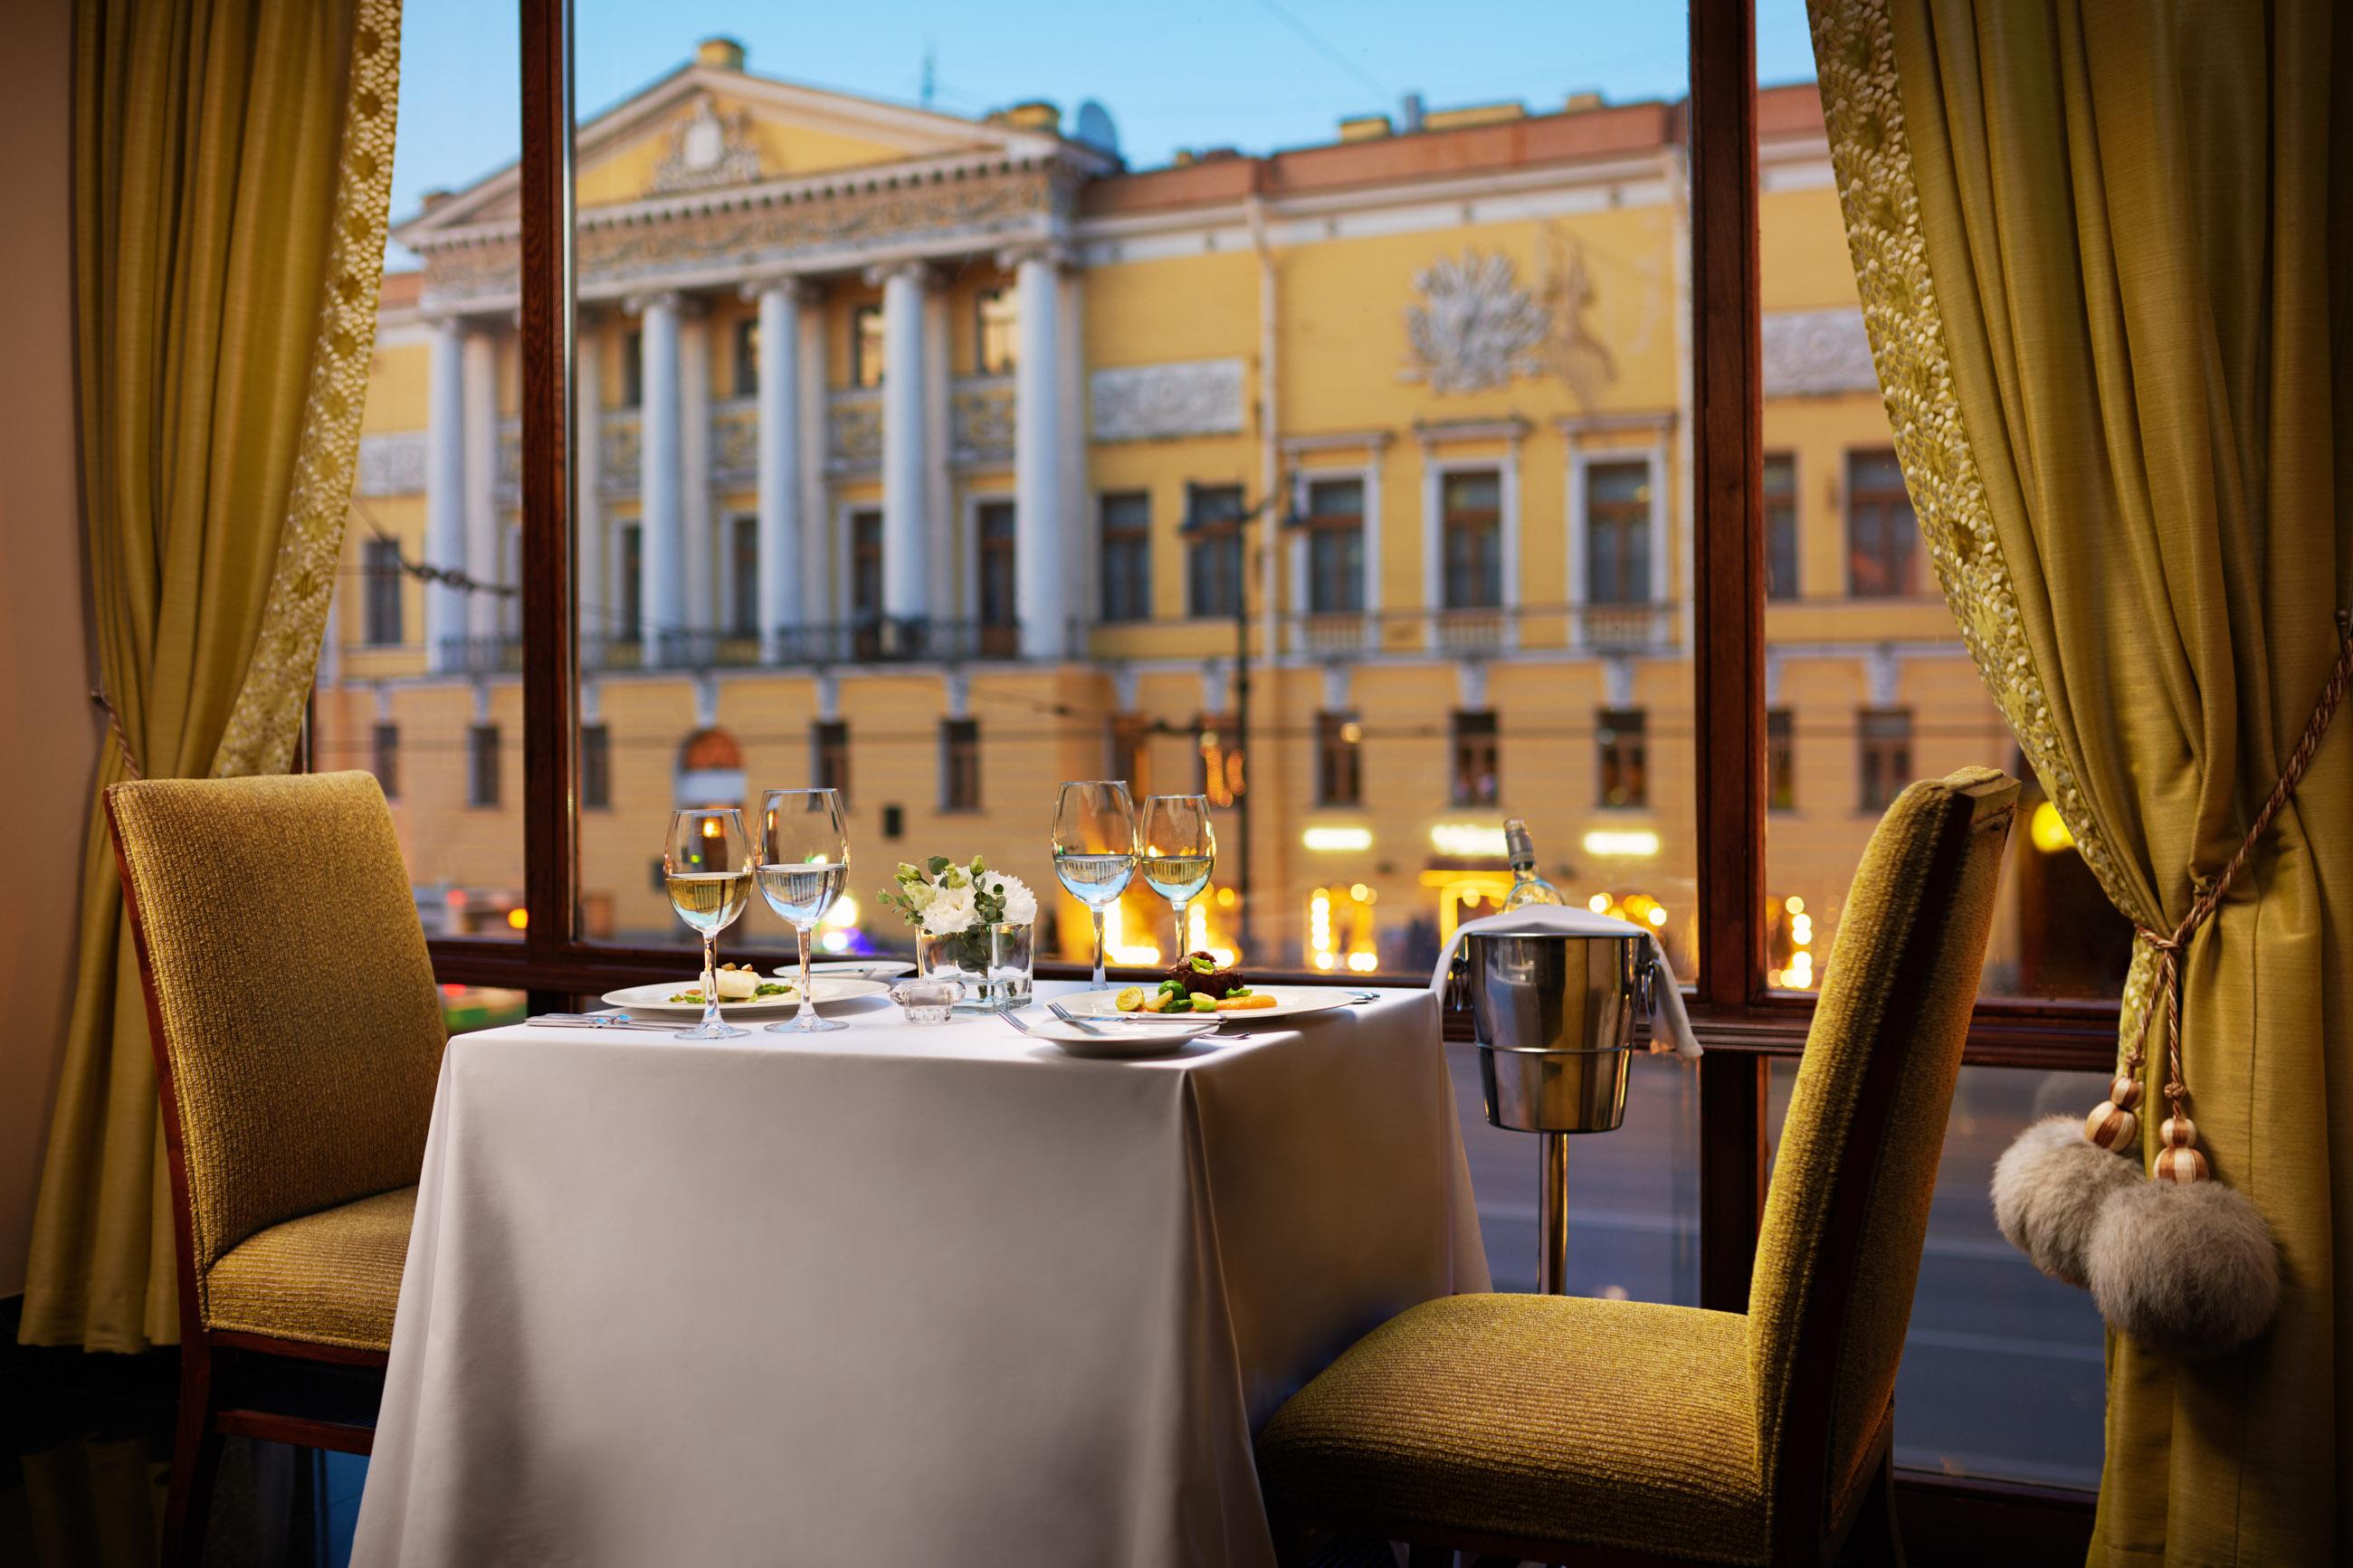 https://bubo.sk/uploads/galleries/5055/corinthia_st_petersburg_imperialrestaurant.jpg